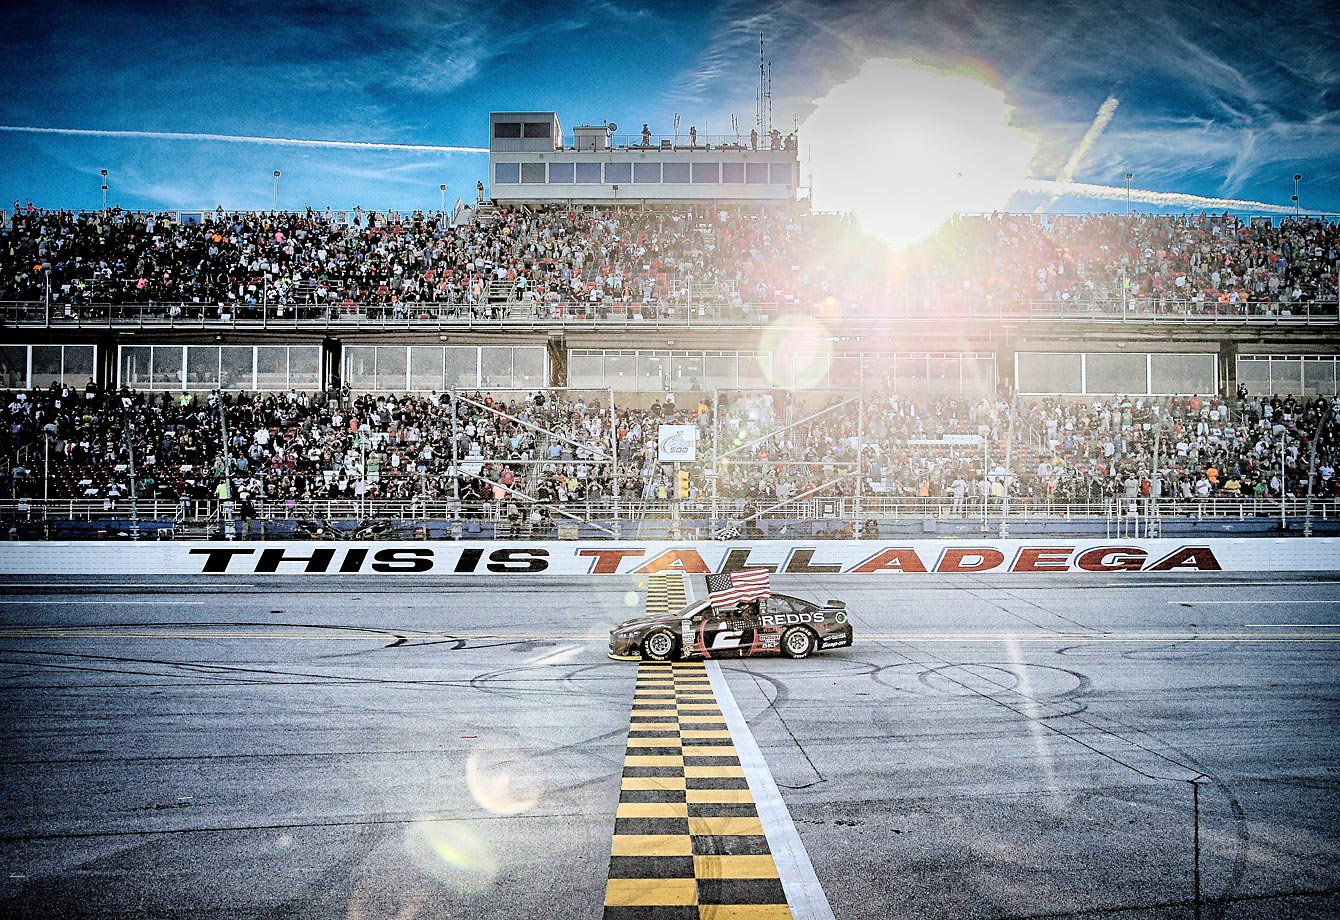 Brad Keselowski celebrates after winning the NASCAR Sprint Cup Series GEICO 500 at Talladega.